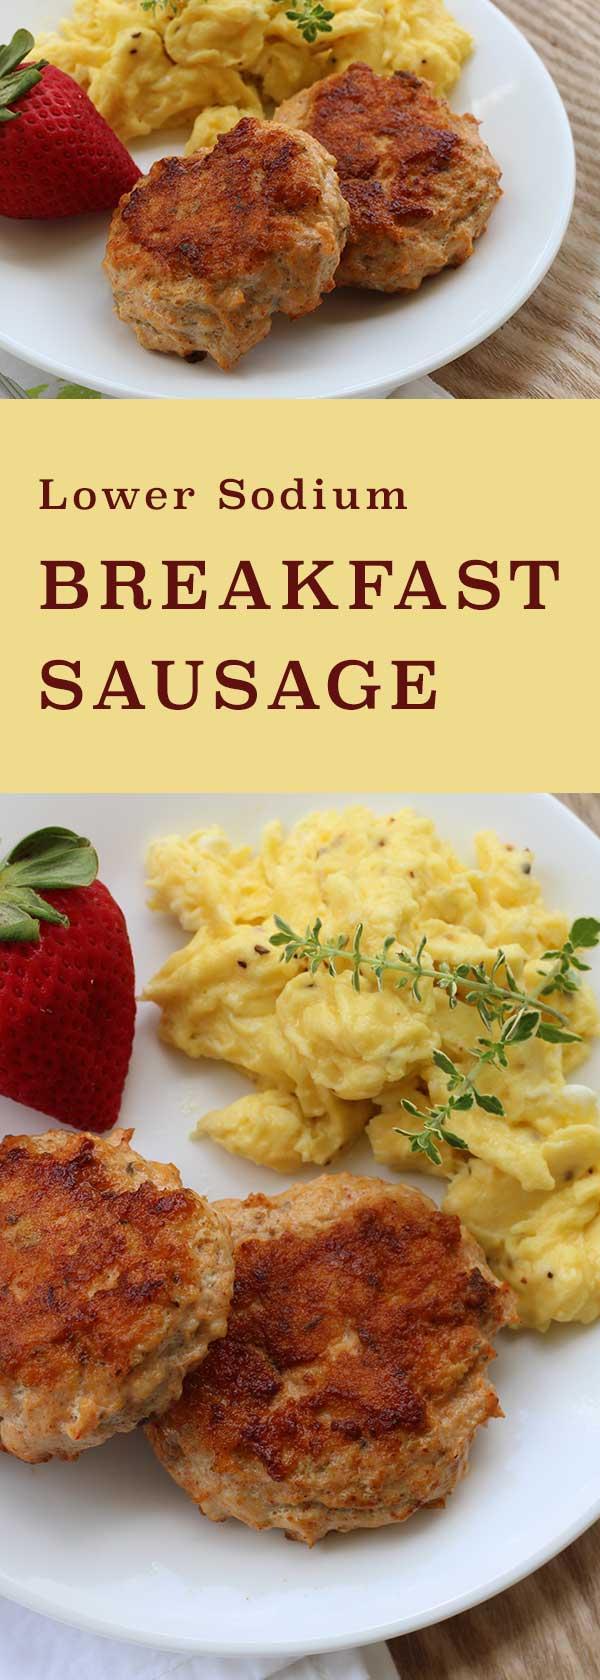 Lower Sodium Breakfast Sausage | diabeticfoodie.com